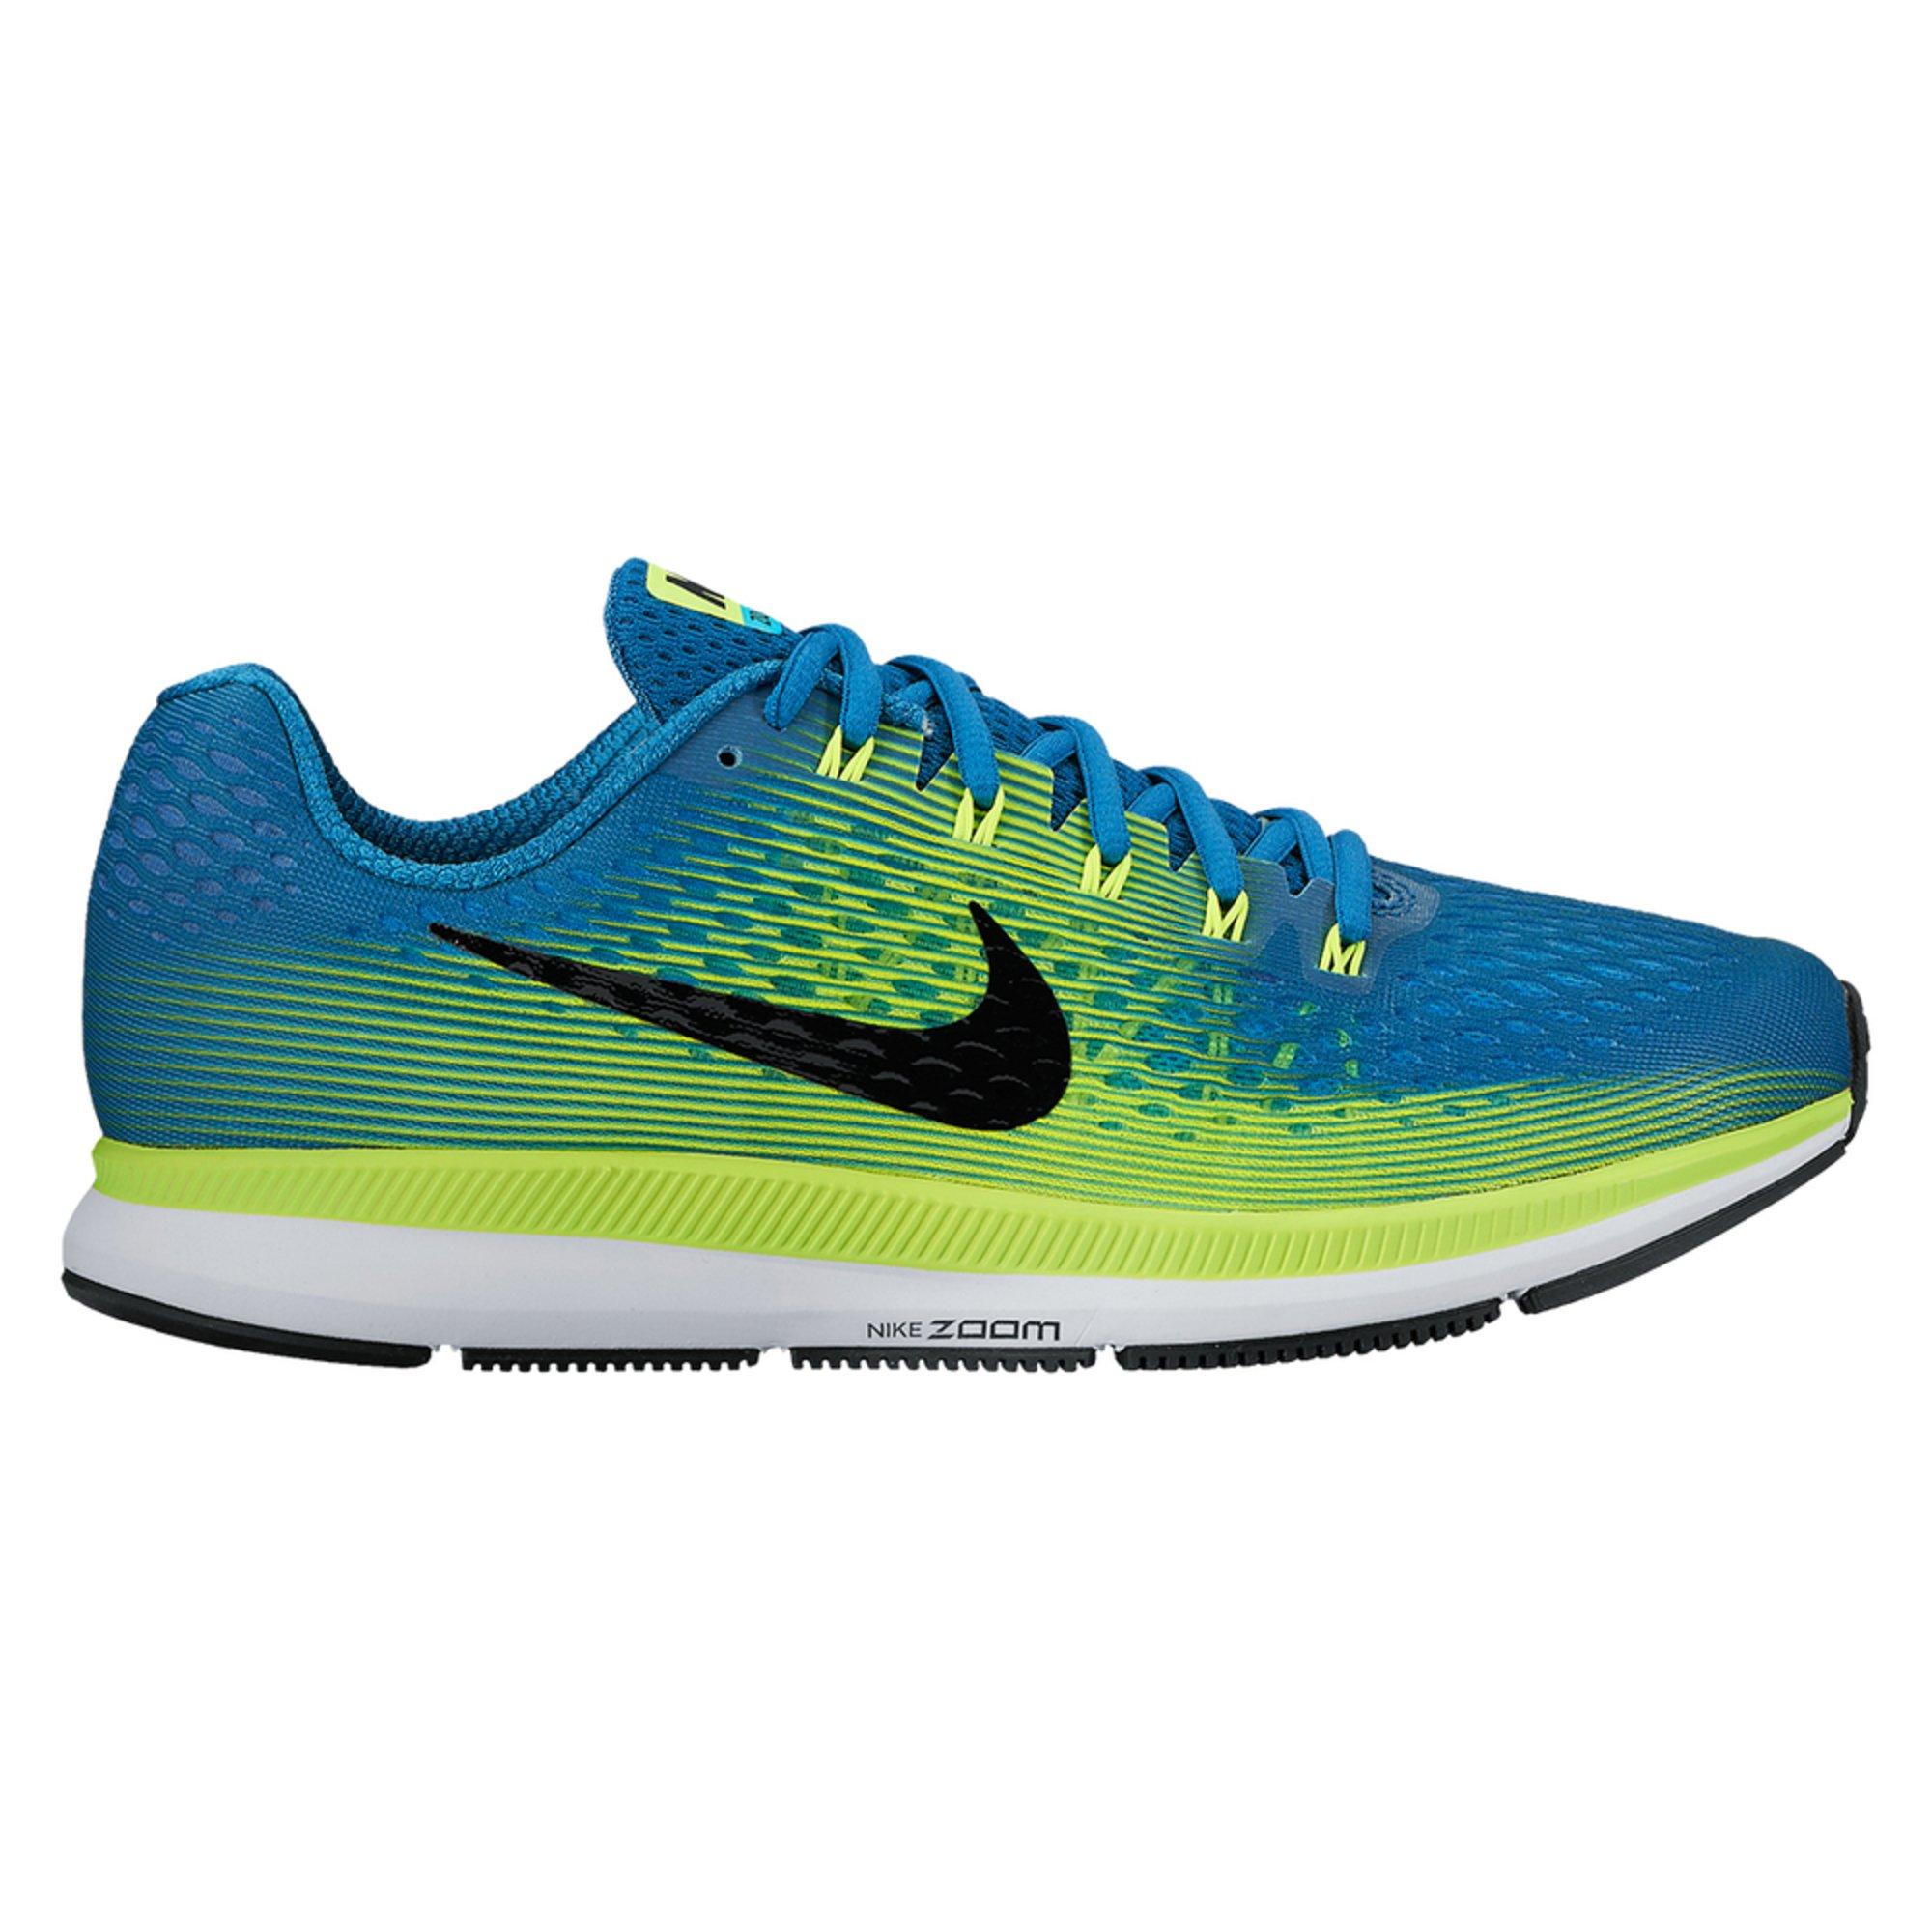 Nike Air Zoom Pegasus 34 Men's Running Shoe Industrial Blue/ Black/ Volt/  Chlorine Blue | Shoes - Shop Your Navy Exchange - Official Site